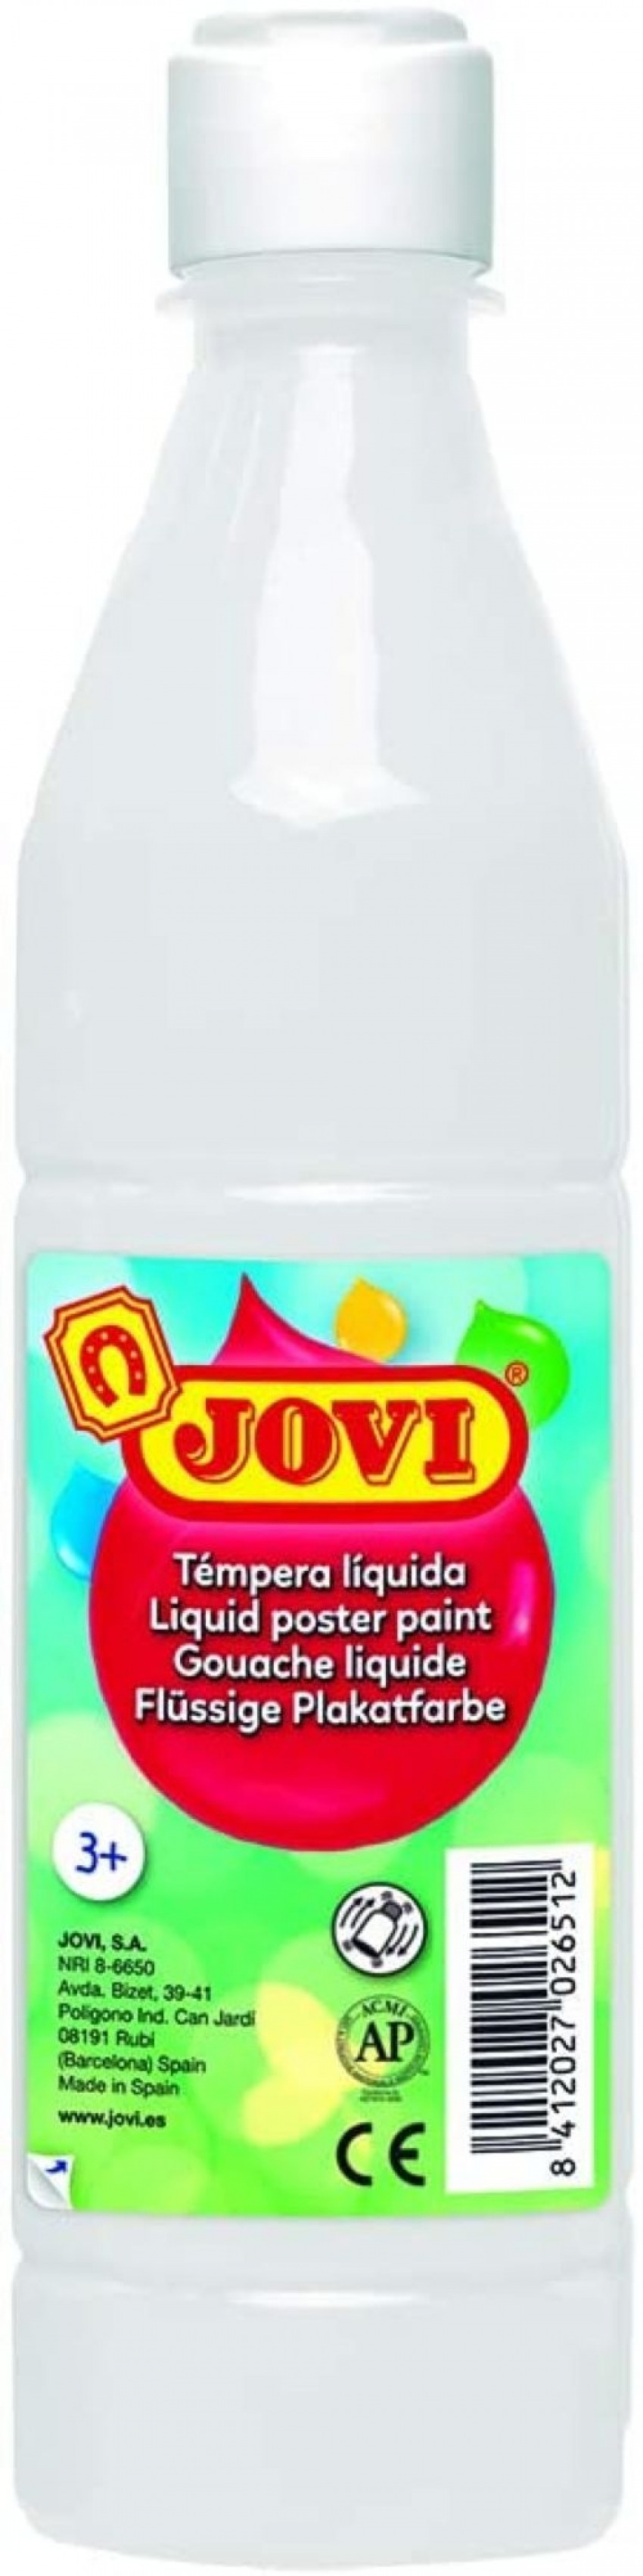 Bote tempera liquida jovi blanco 500 ml 8412027003643